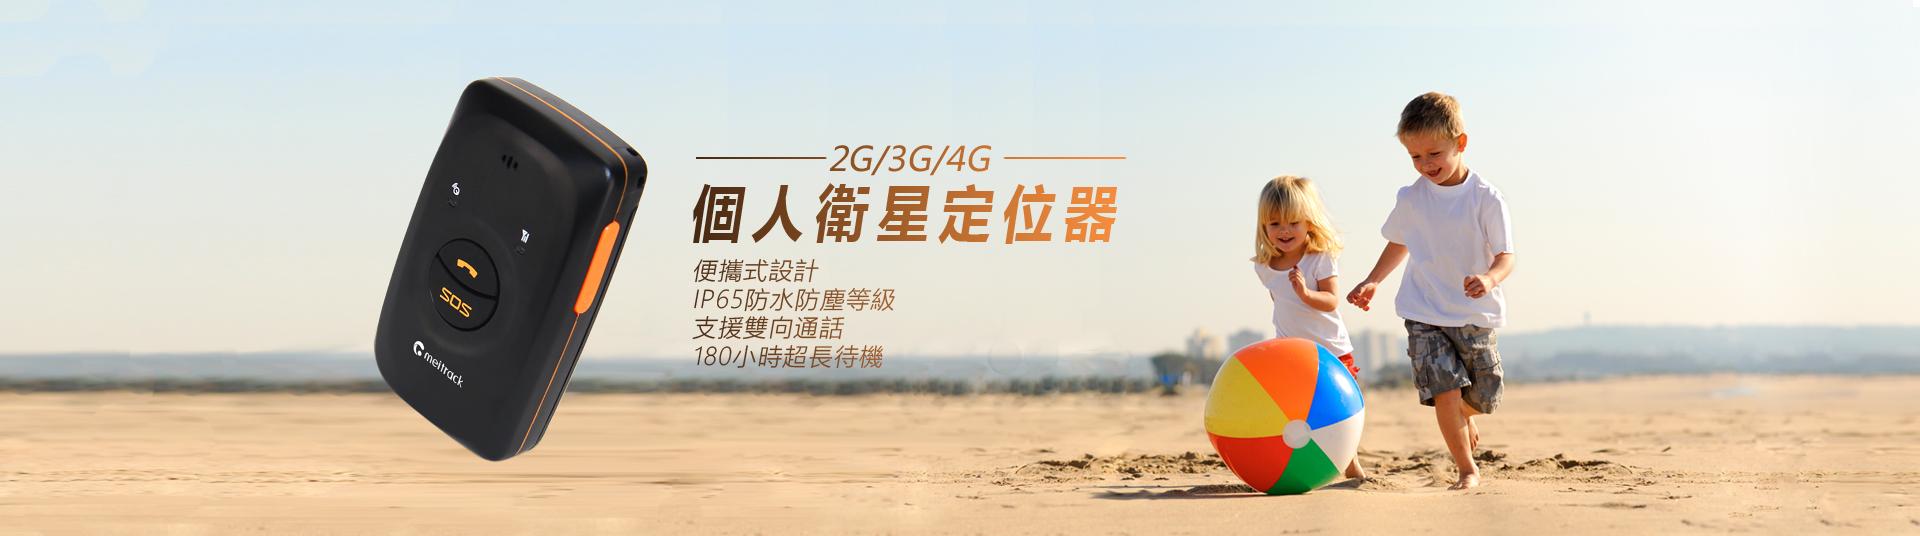 MT90-Series-banner_tw